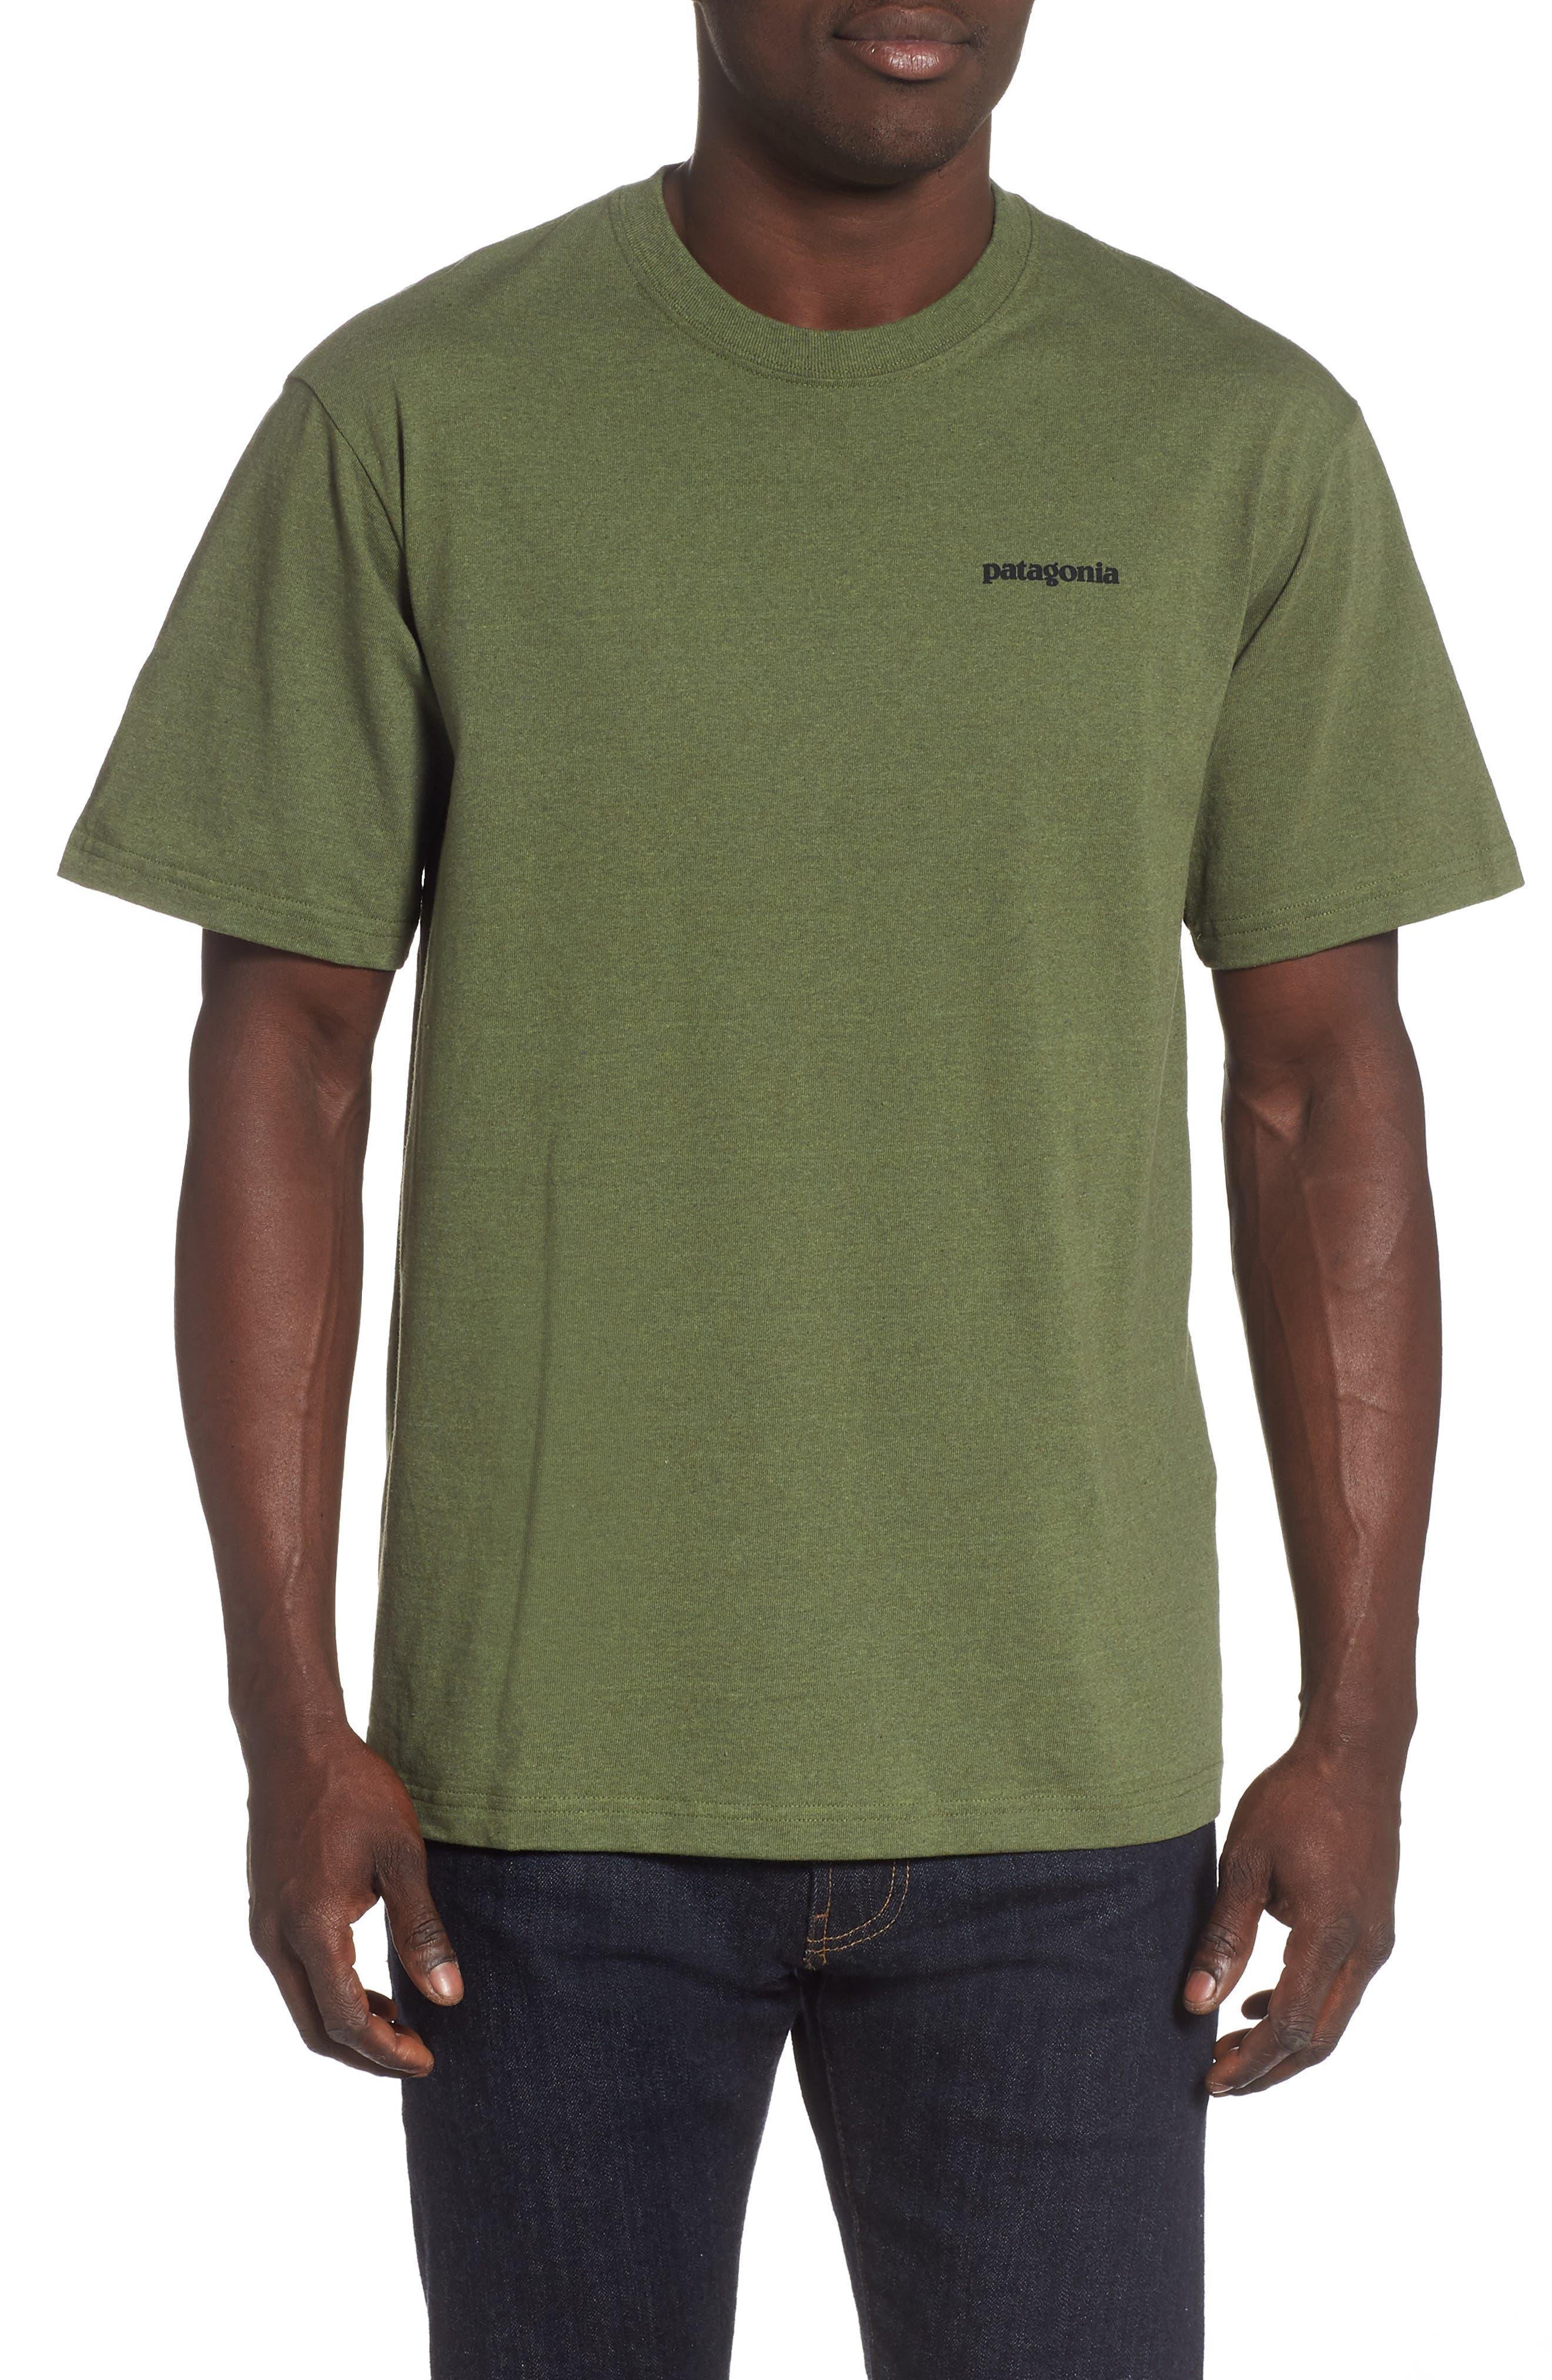 Patagonia Fitz Roy Smallmouth Responsibili-Tee Regular Fit T-Shirt, Green